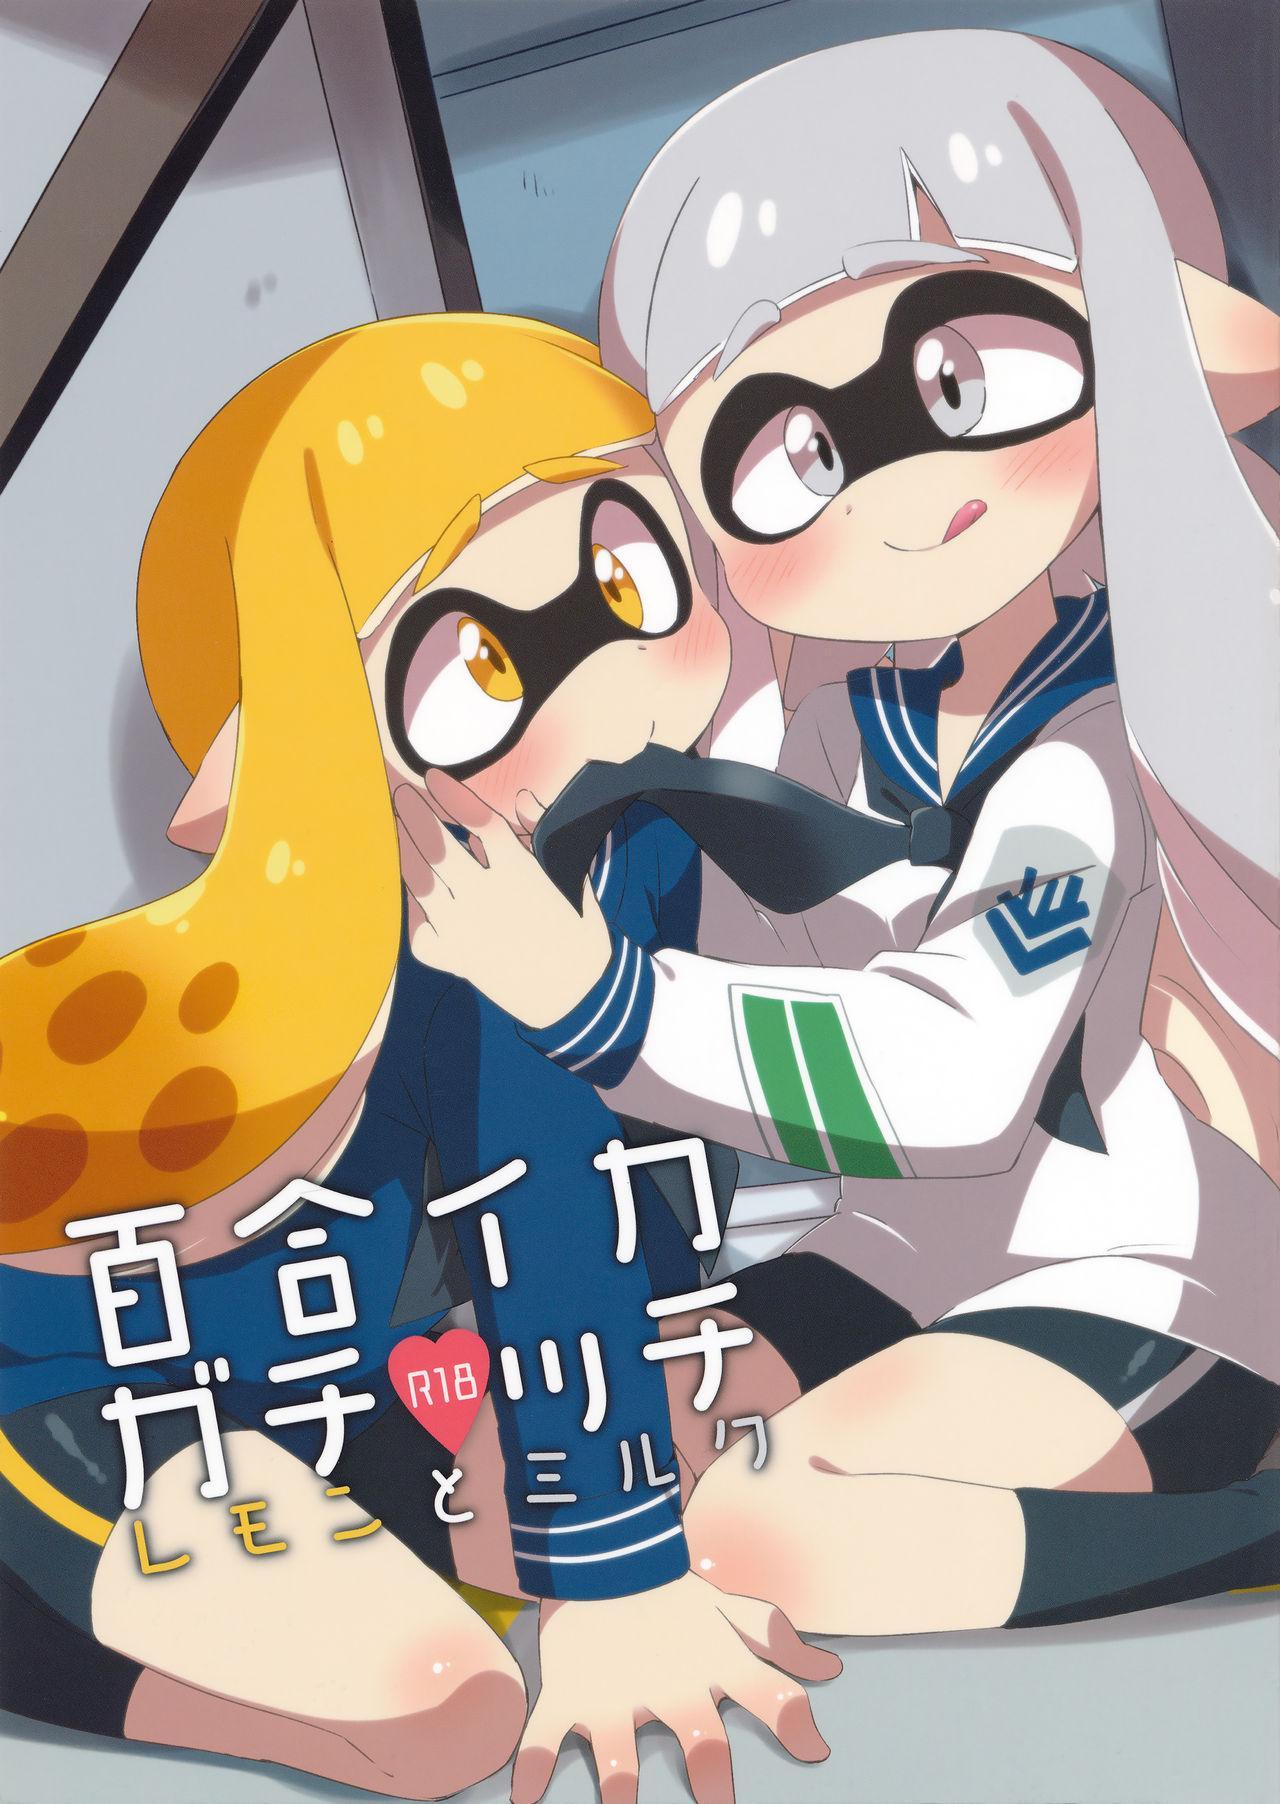 (C89) [Colomonyu (Eromame)] Yuri Ika Gachi♥cchi - Lemon to Milk | Super Lewd Yuri Squids - Lemon and Milk (Splatoon) [English] 0